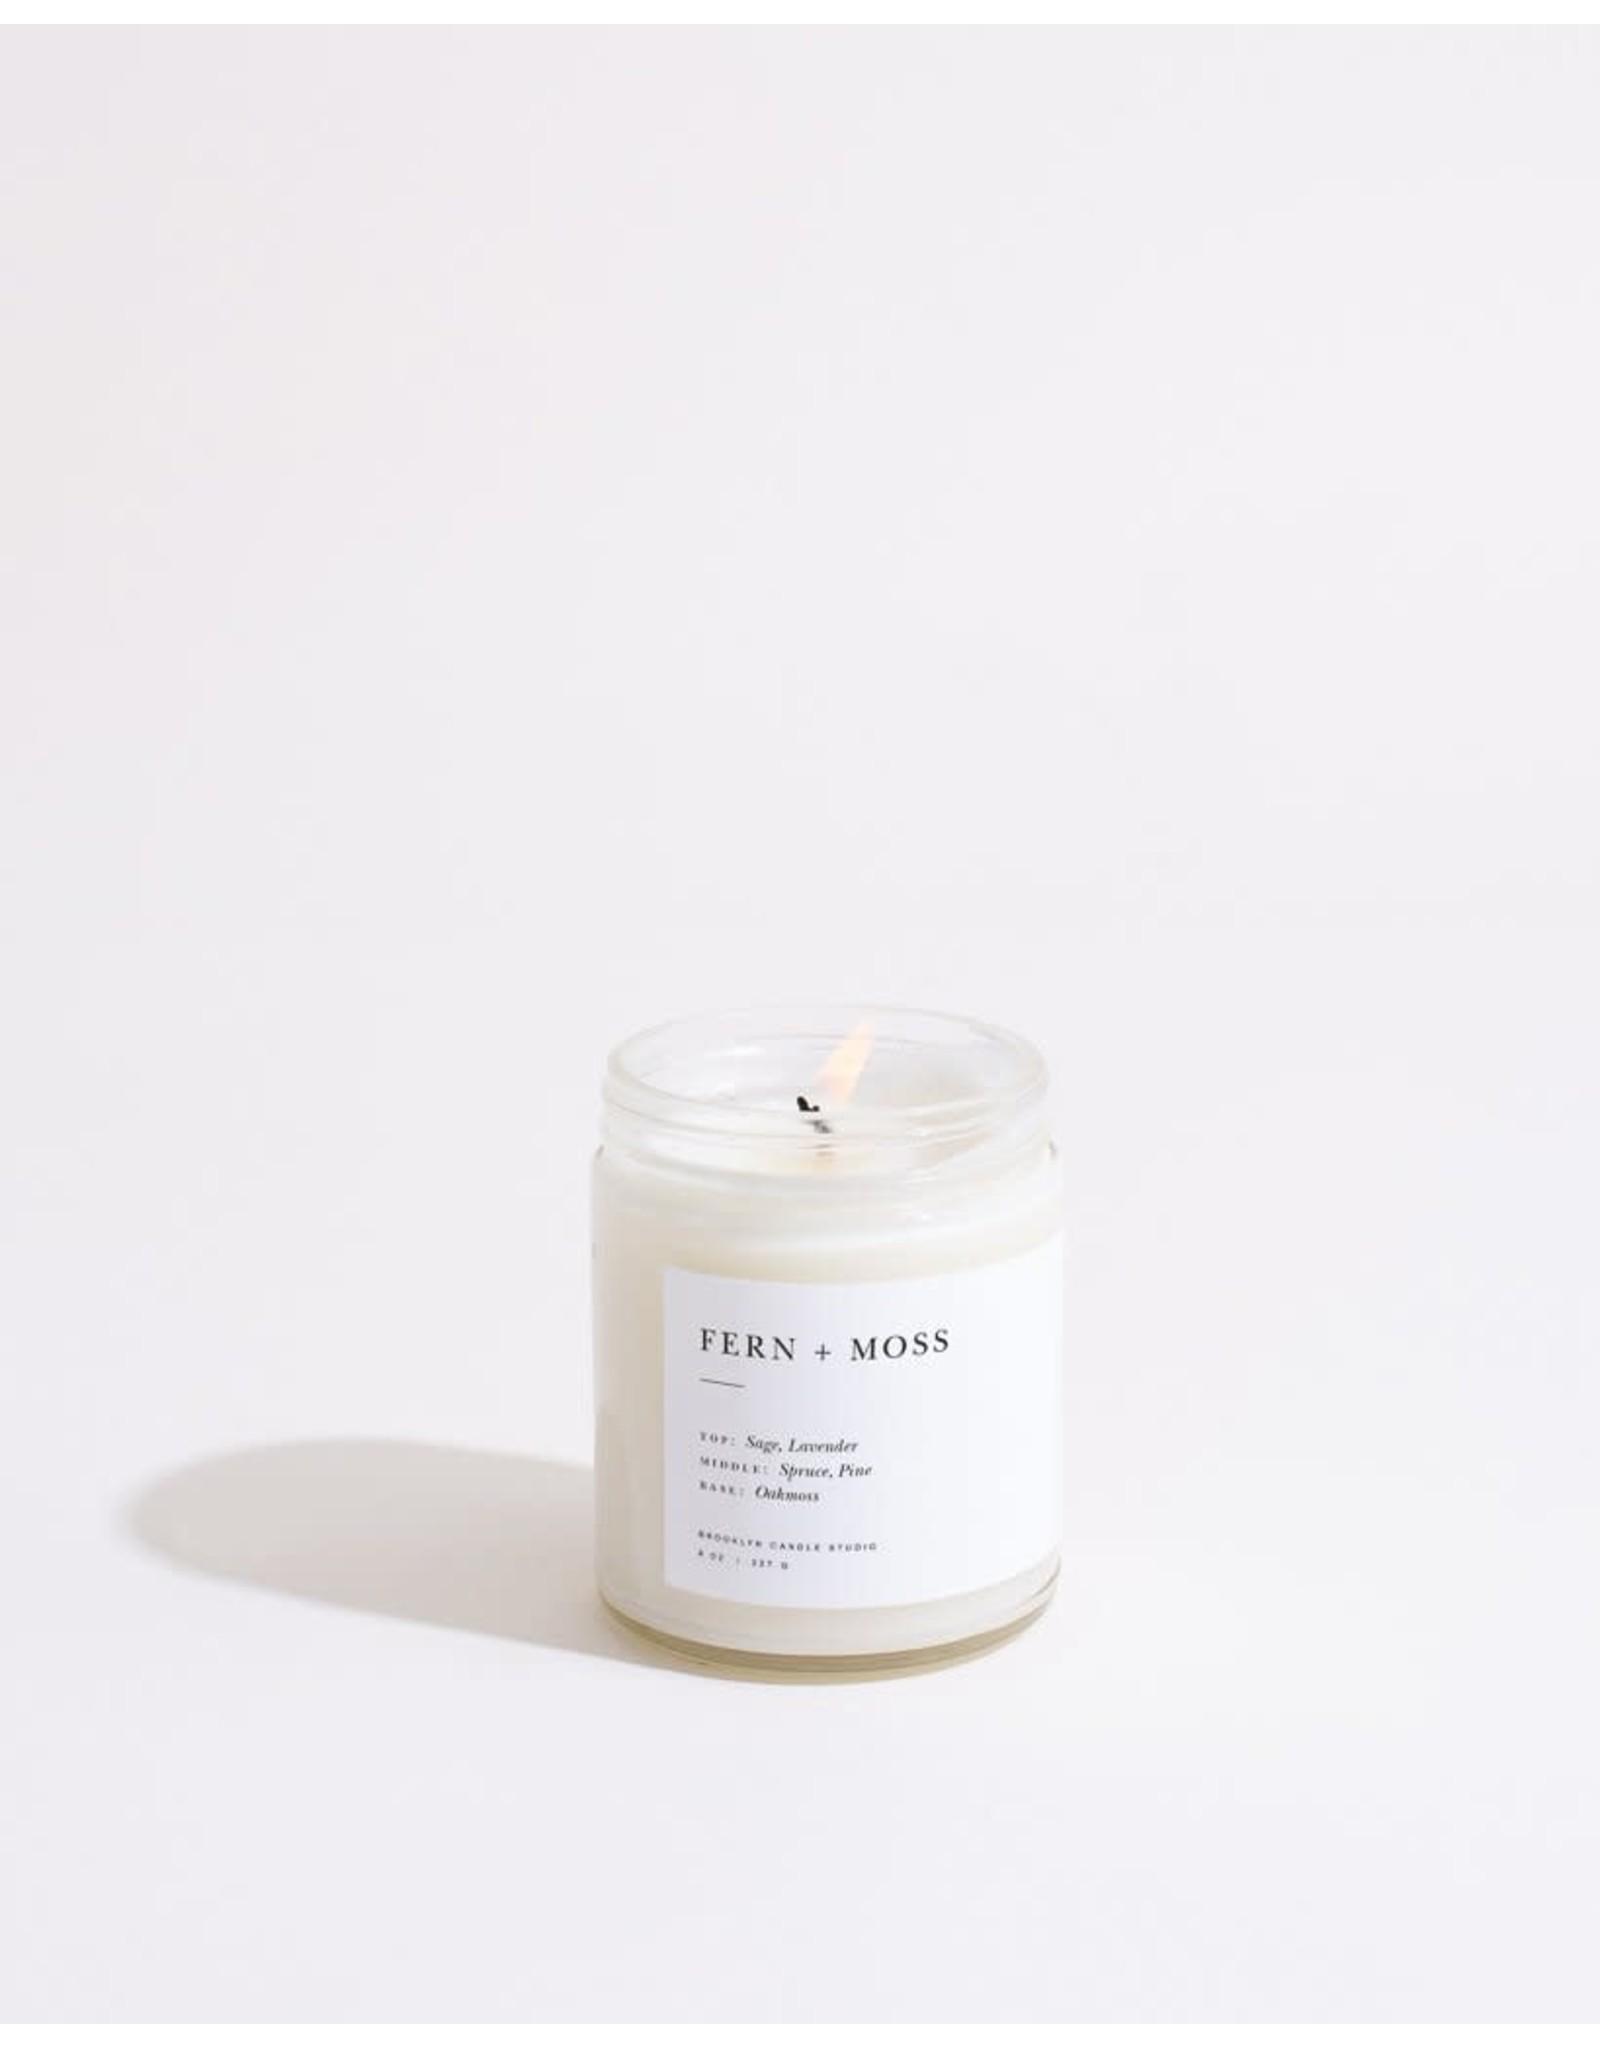 Brooklyn Candle Studio Fern + Moss - Minimalist Jar Candle - Brooklyn Candle Studio